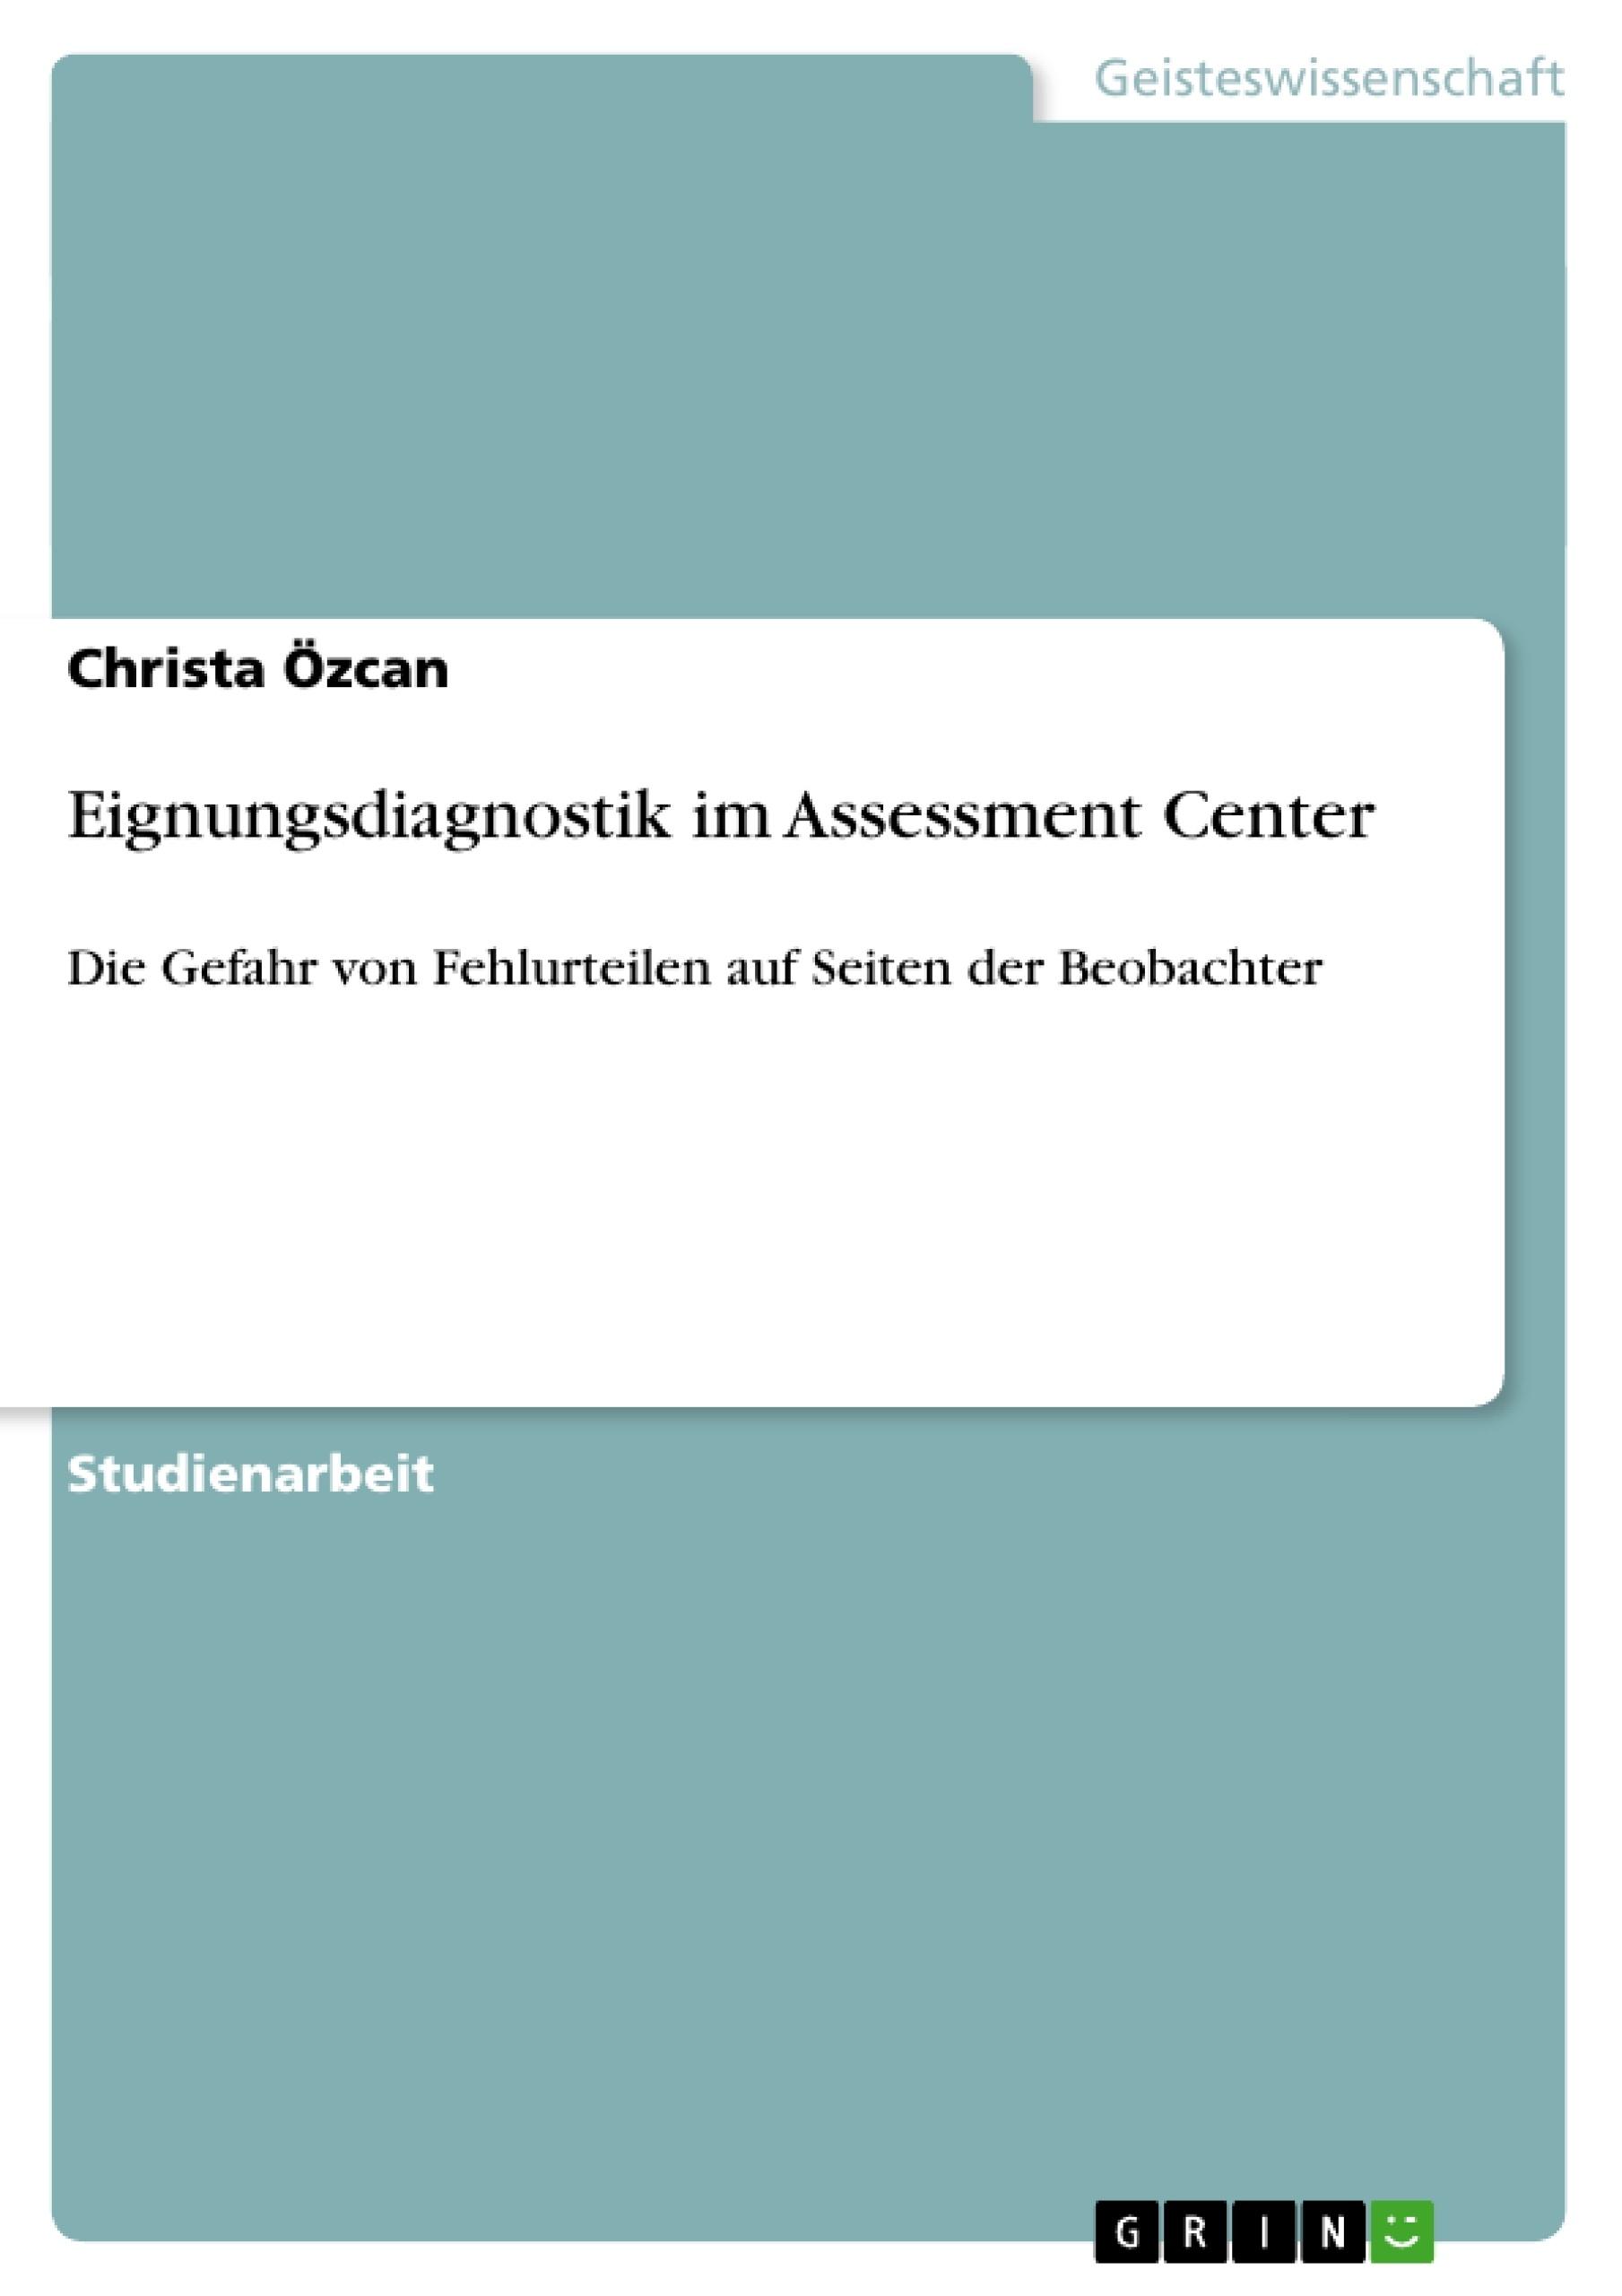 Titel: Eignungsdiagnostik im Assessment Center